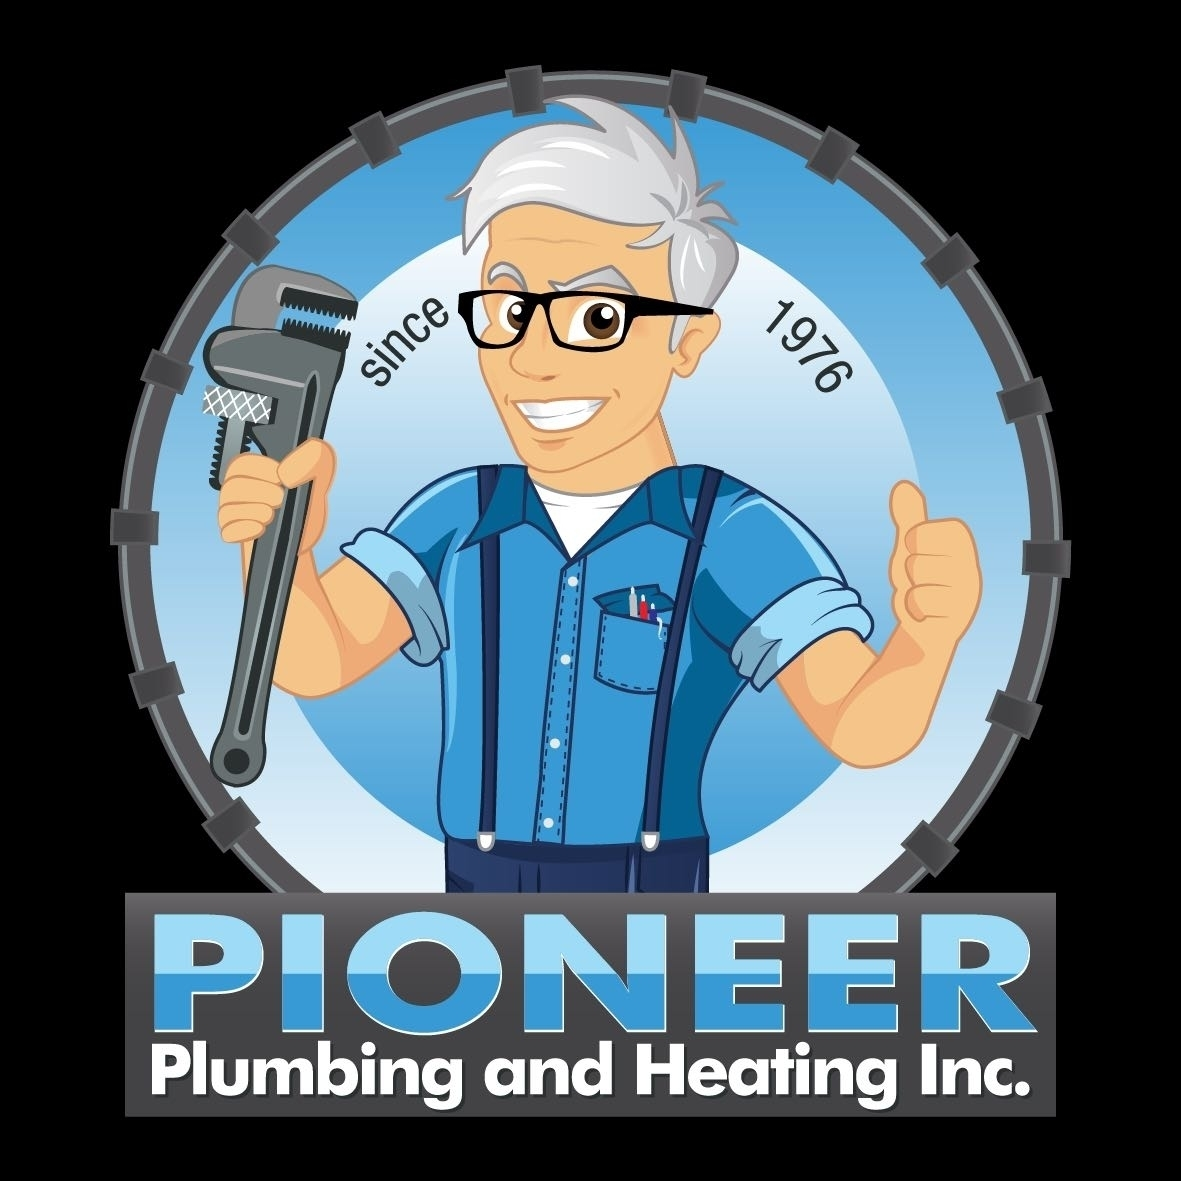 Pioneer Plumbing and Heating Inc in Vancouver